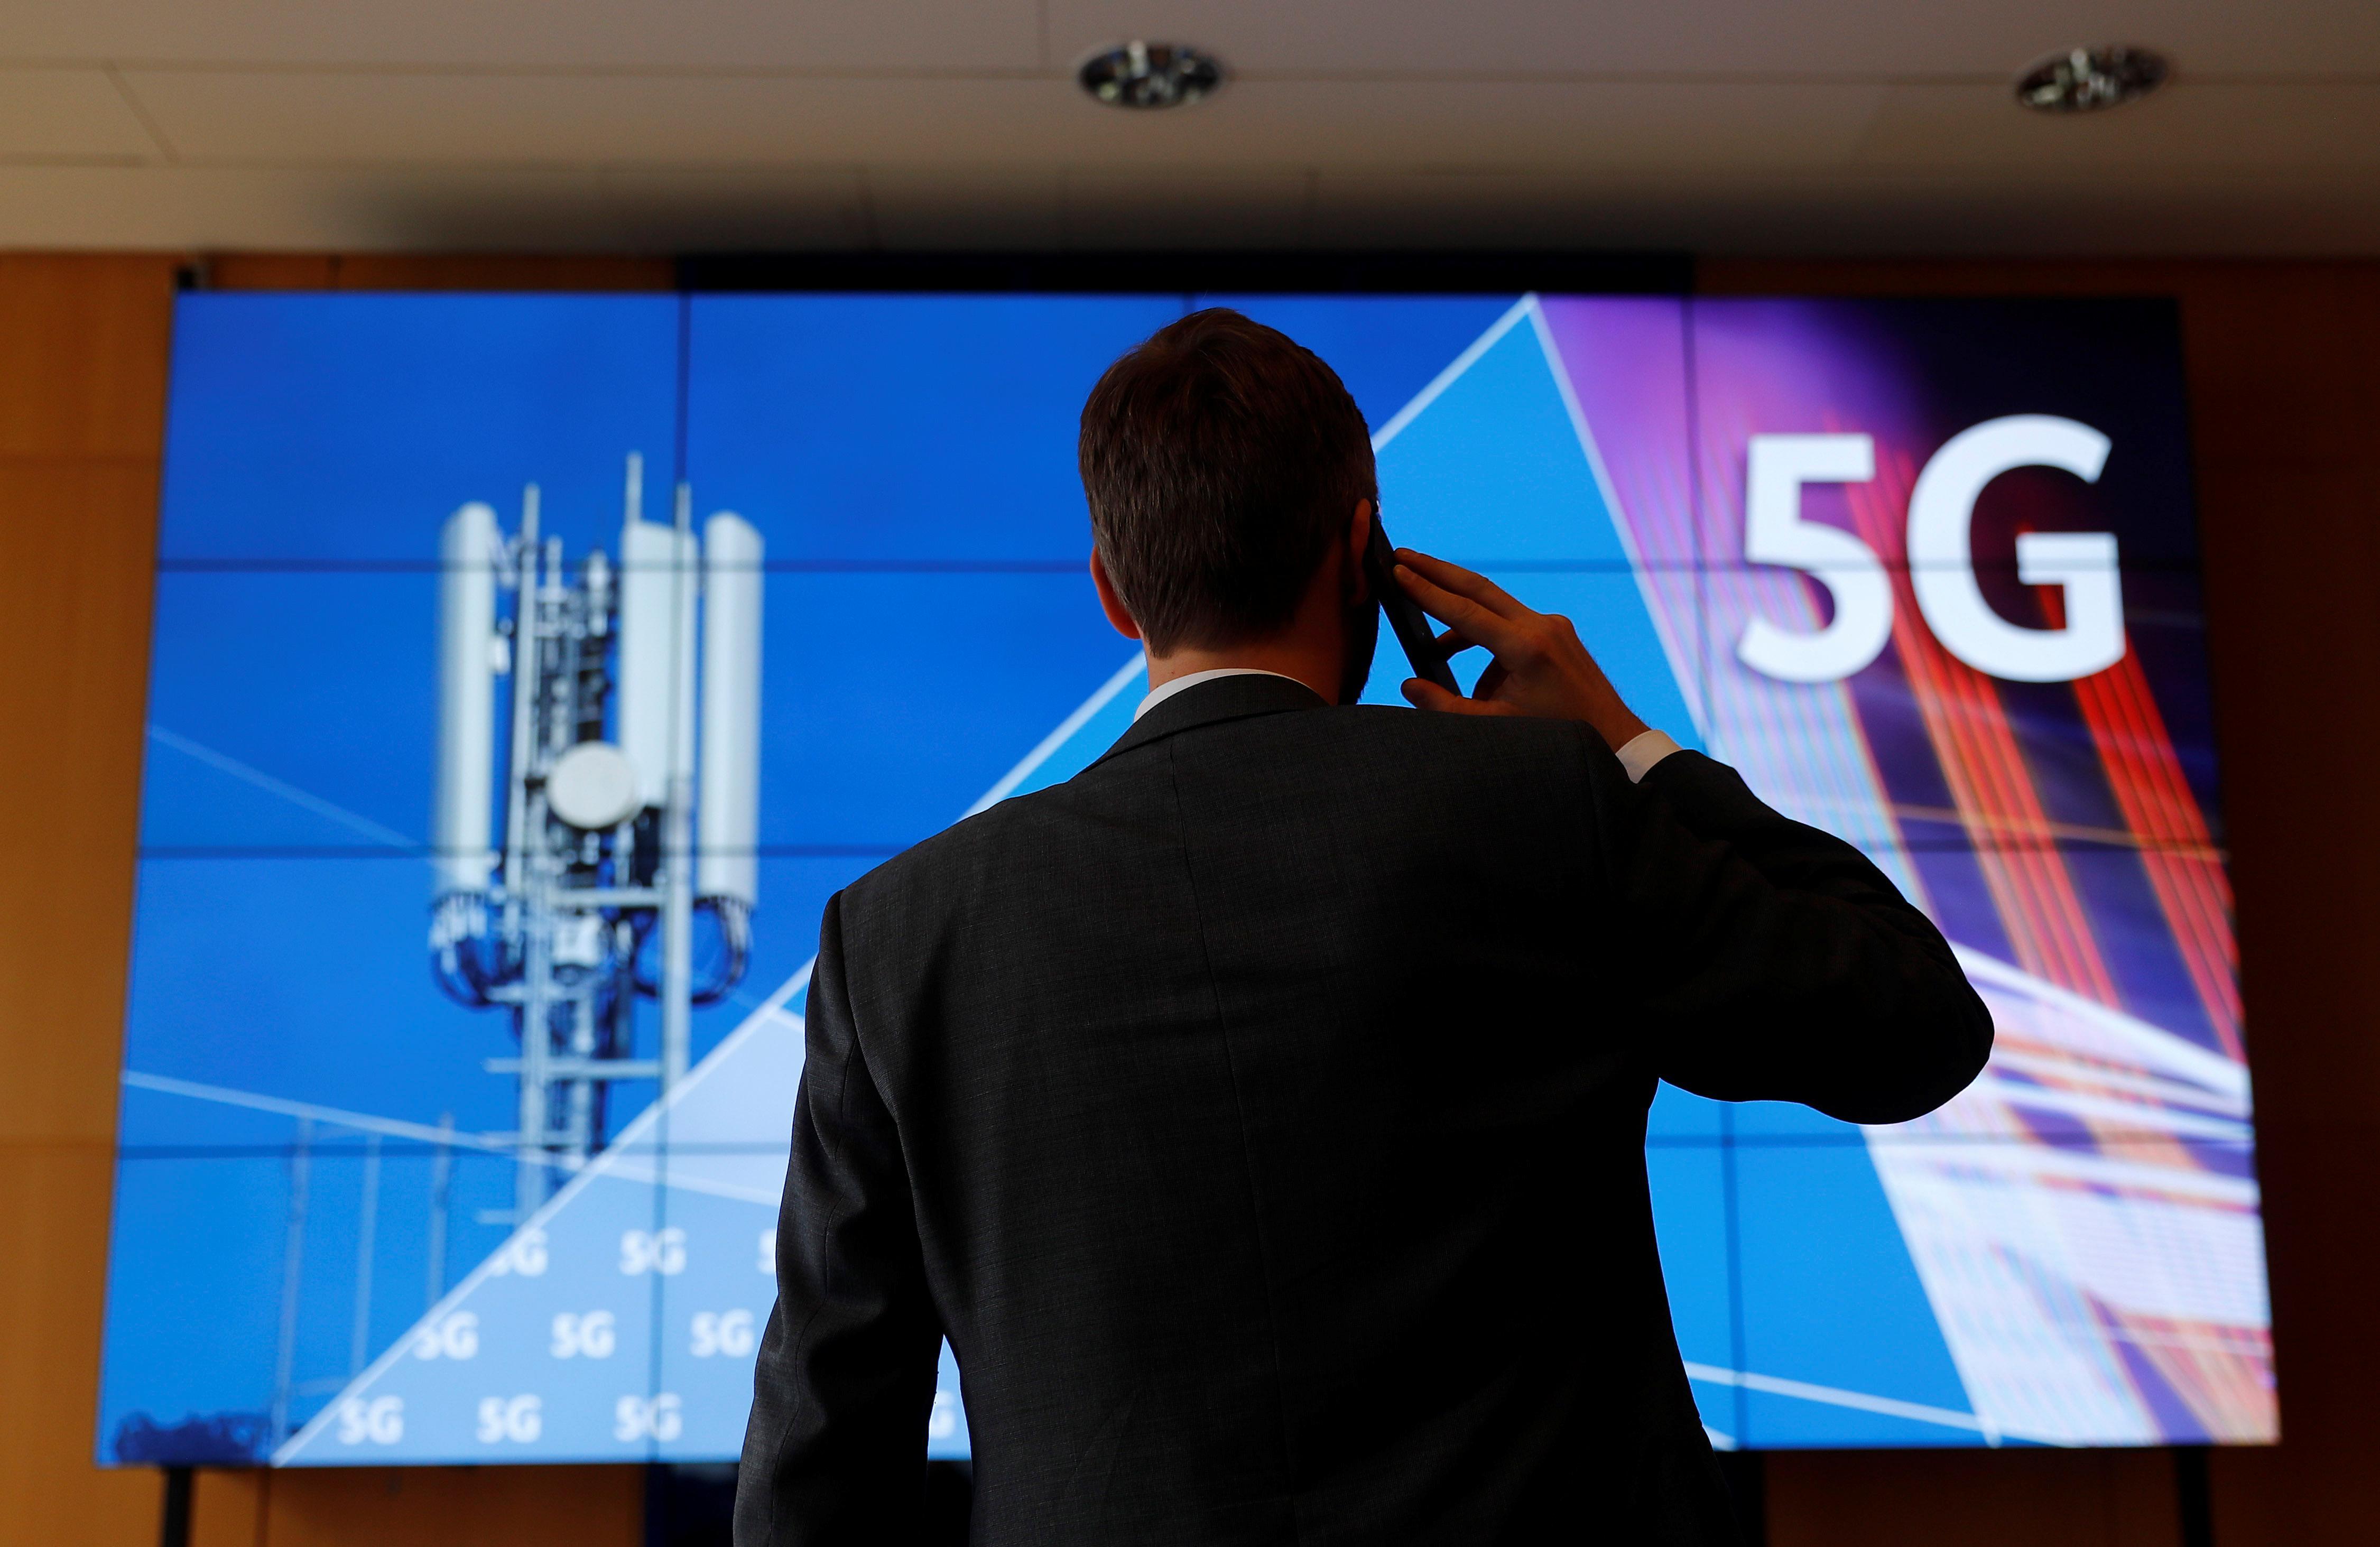 Germany raises 6.55 billion euros in epic 5G spectrum auction